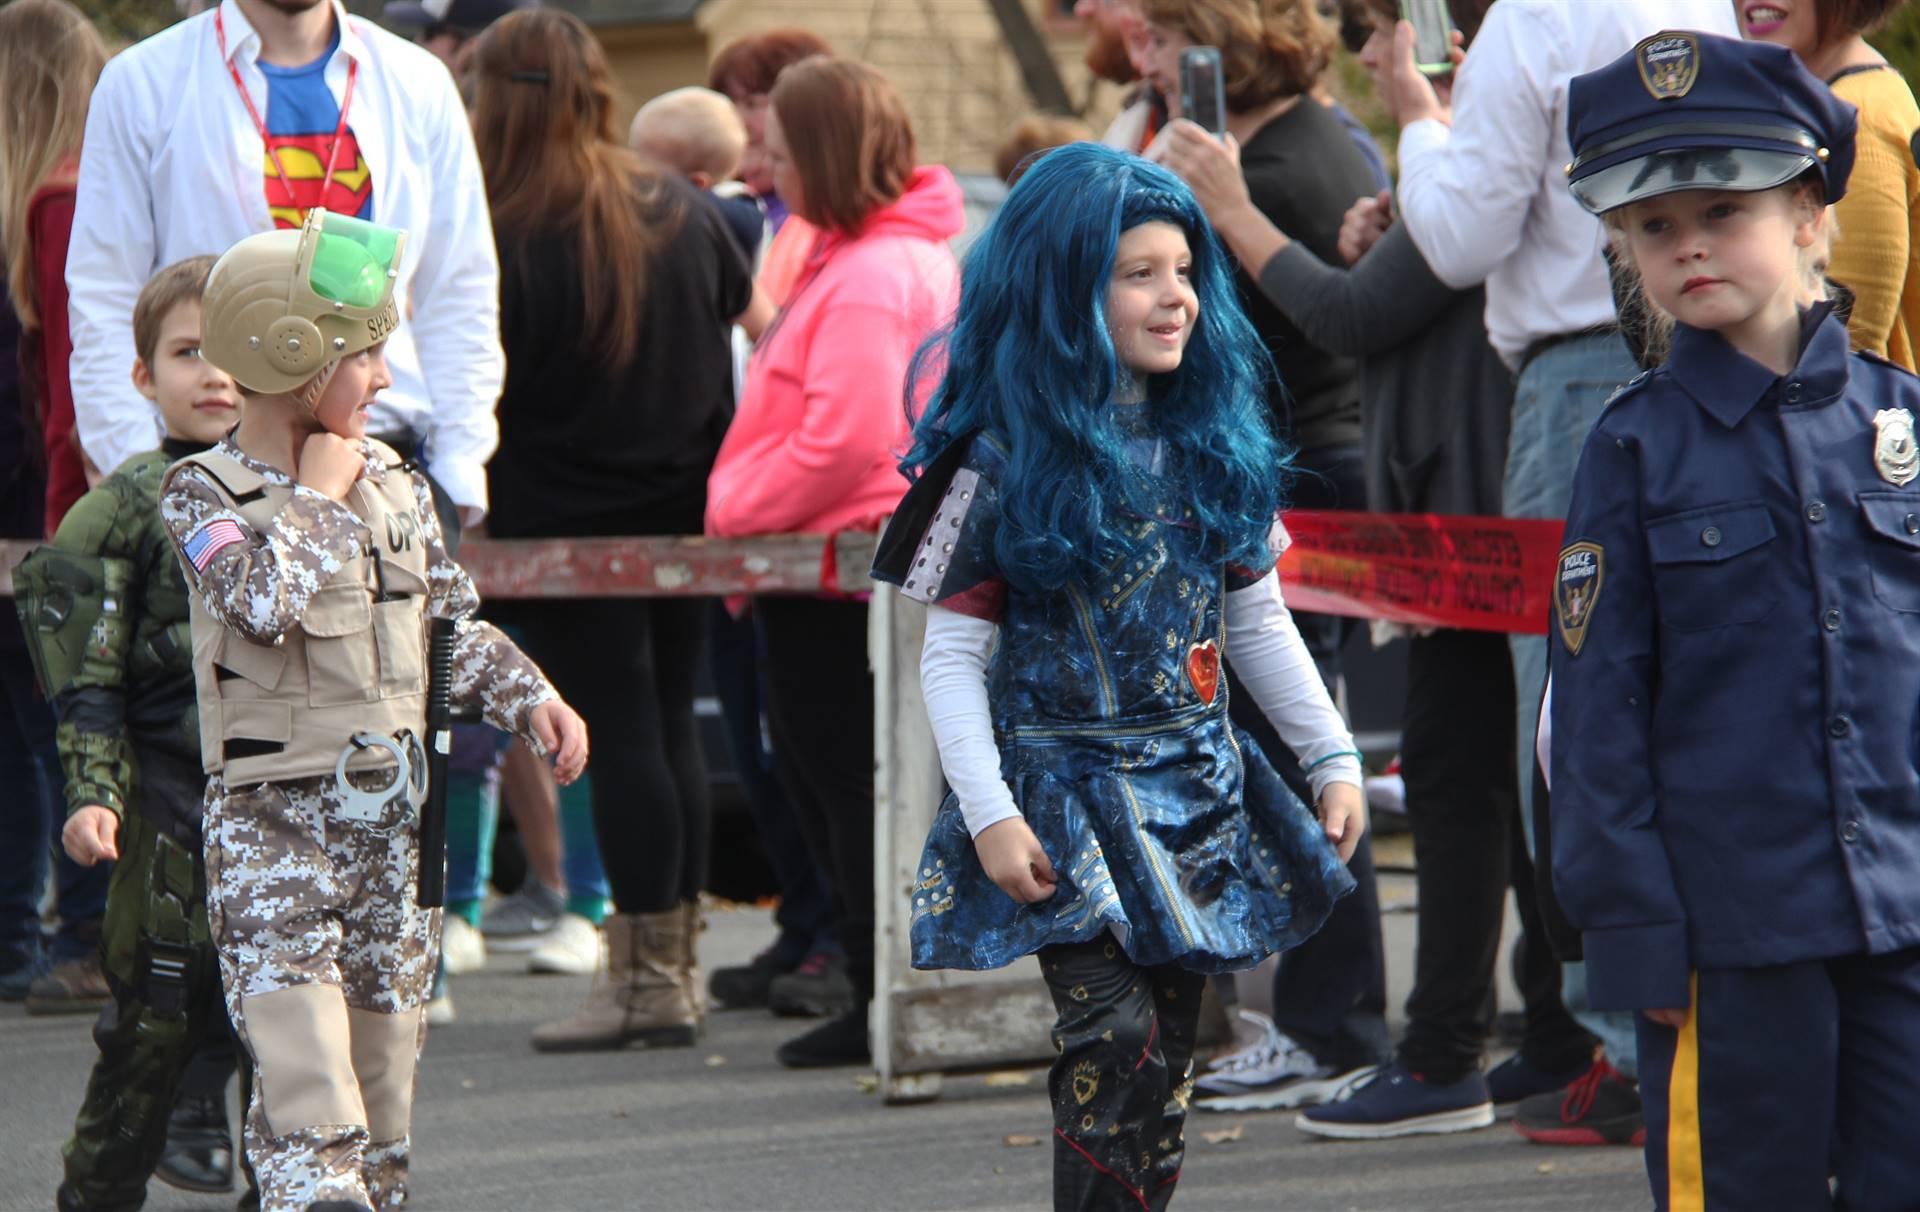 students walking wearing halloween costumes